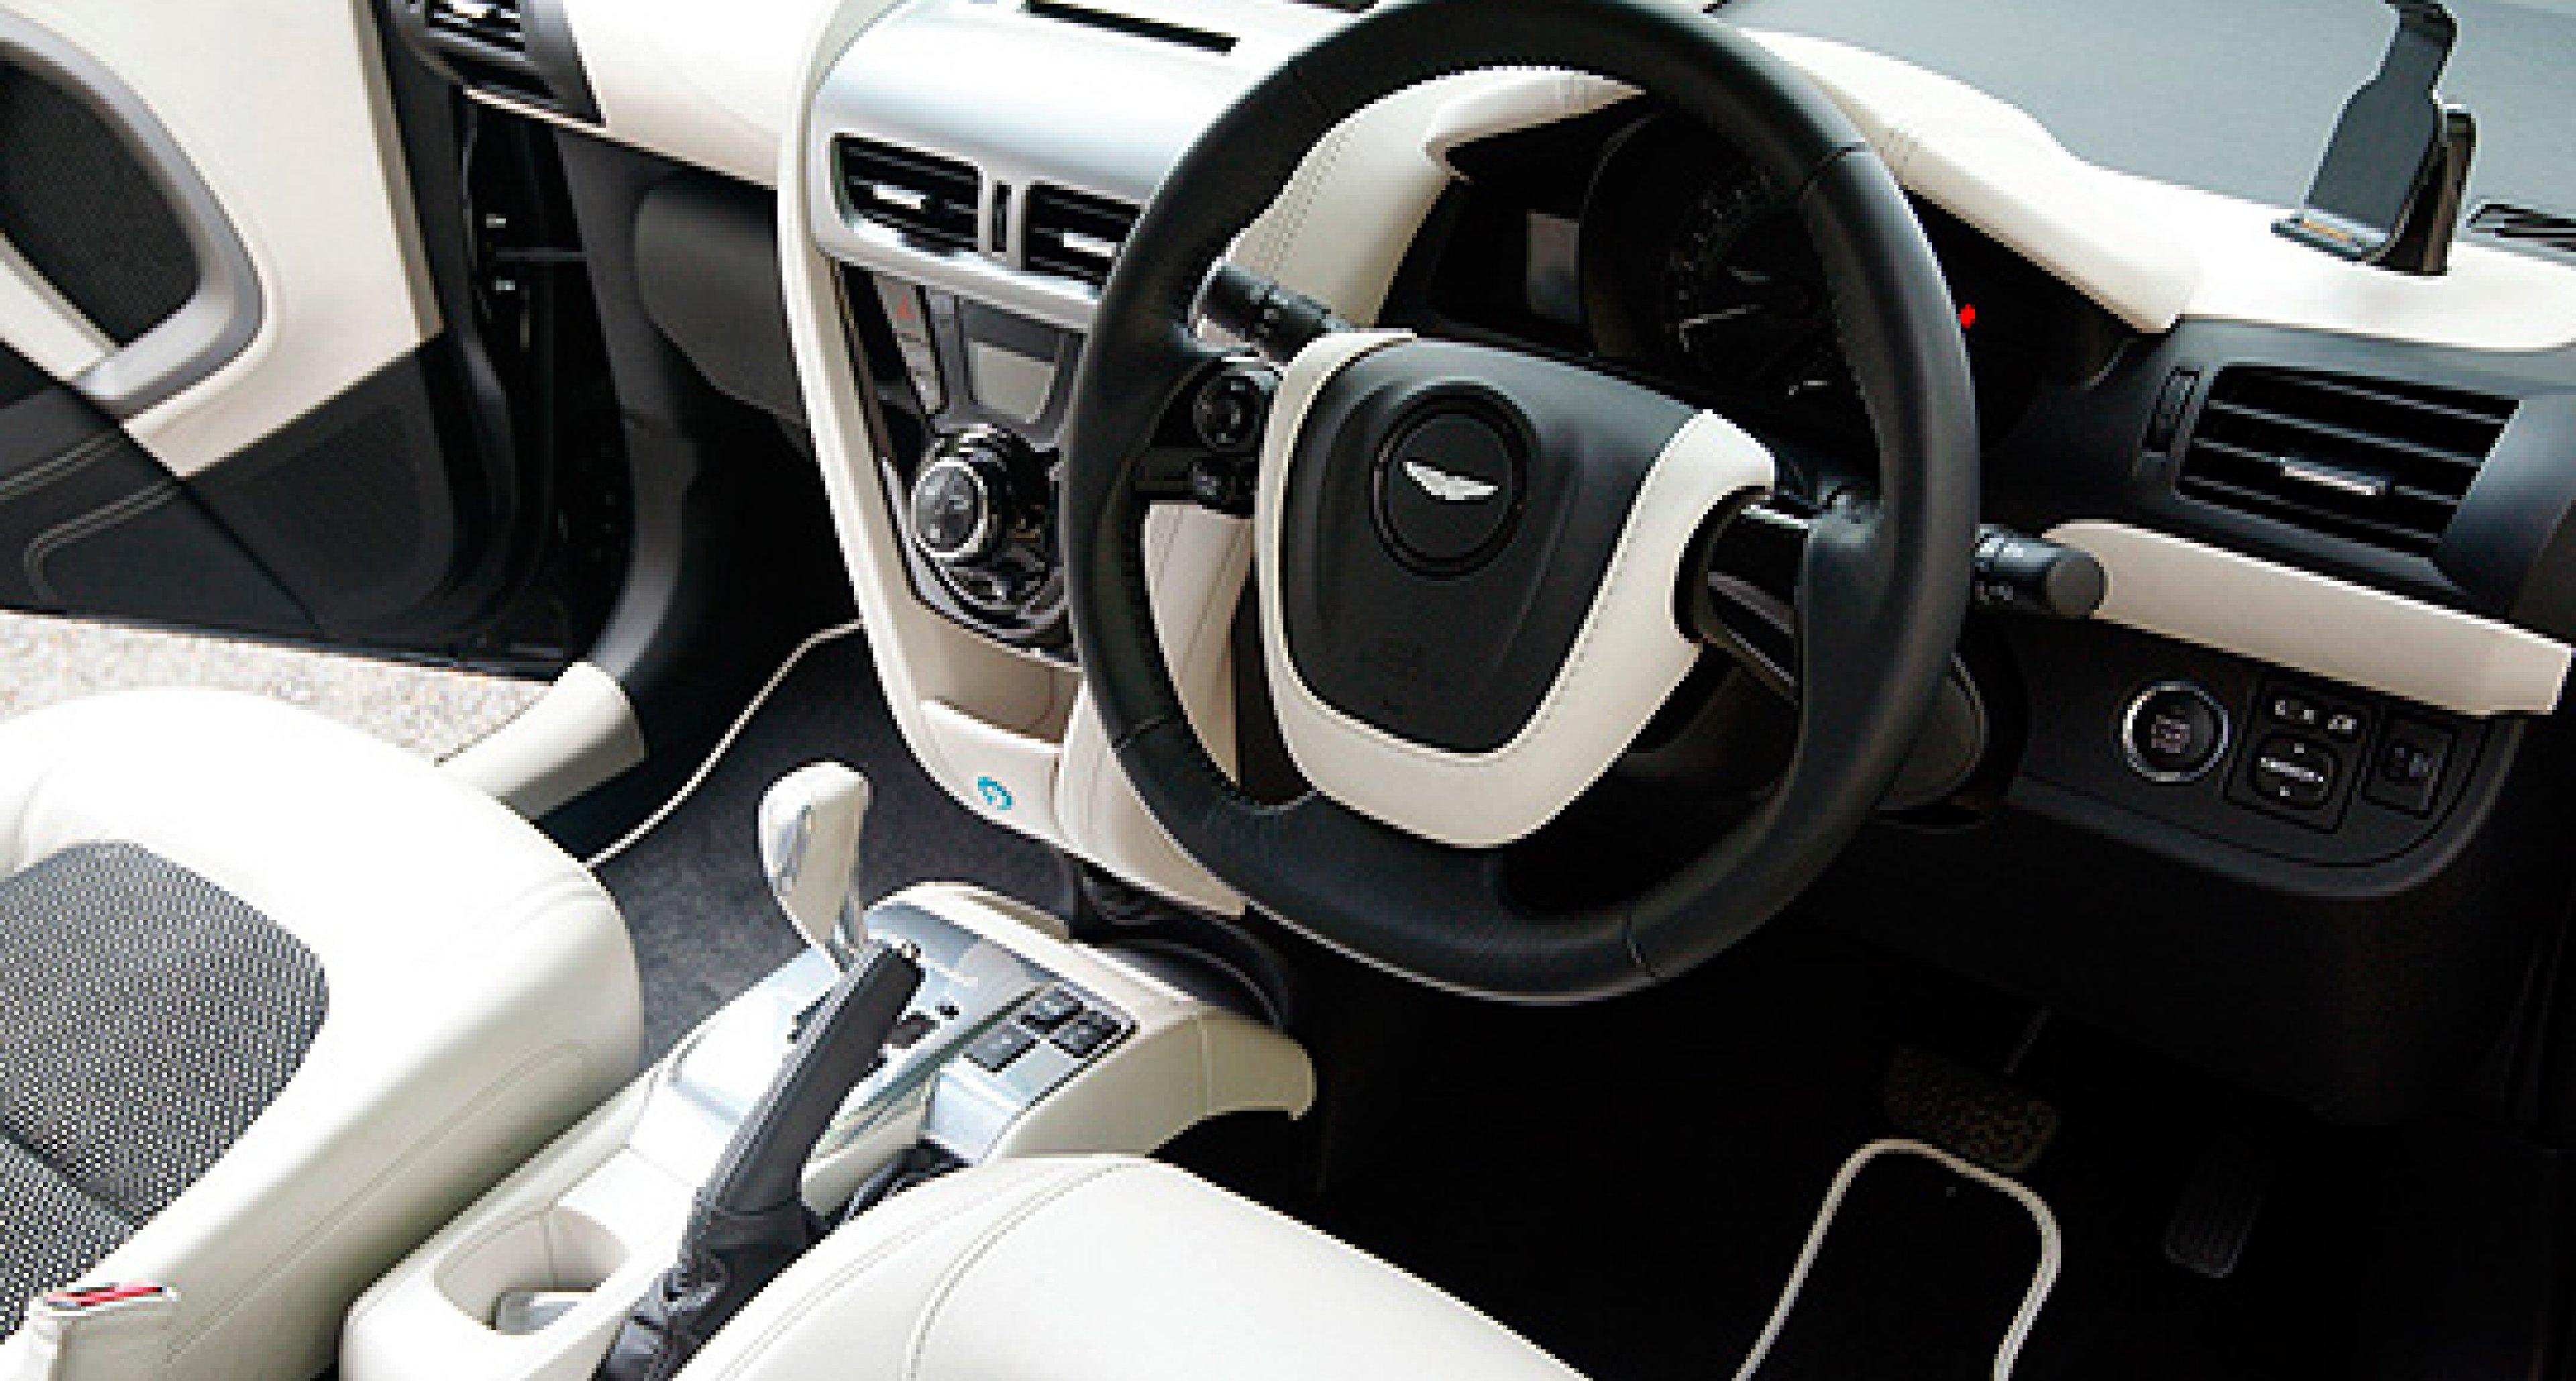 Driven Aston Martin Cygnet Classic Driver Magazine - Aston martin cygnet